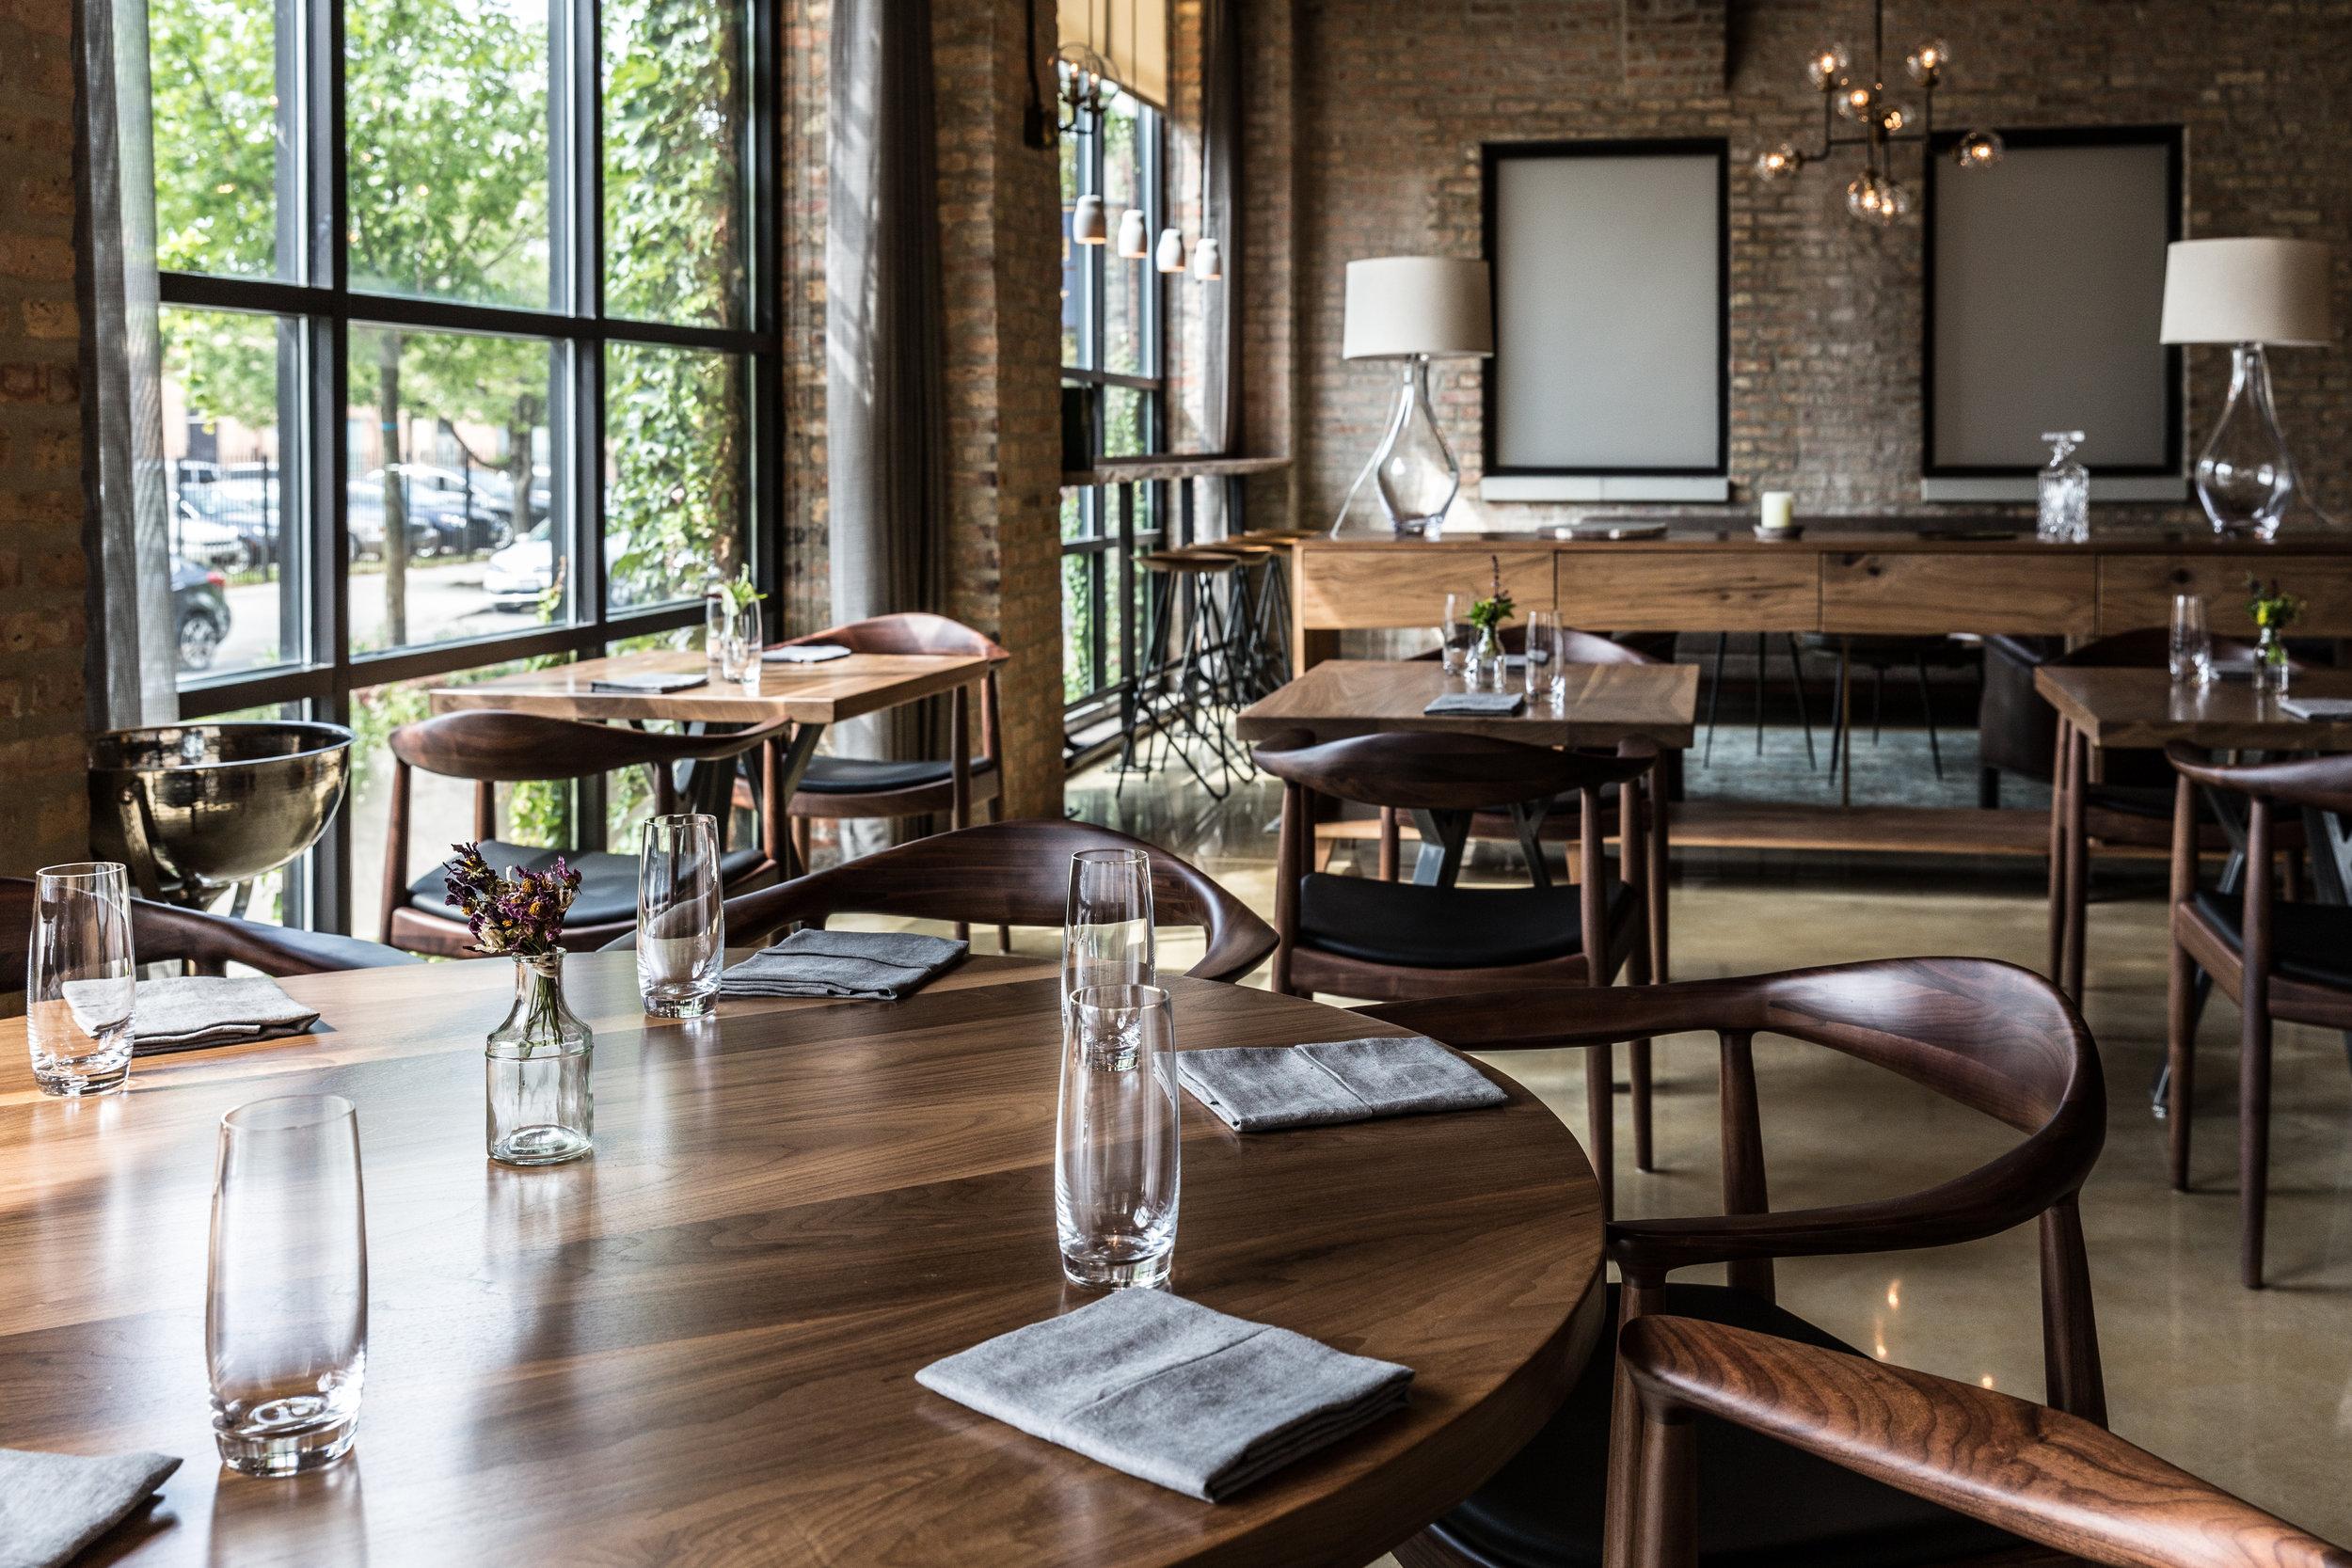 studio-saint-bars-and-restaurants-smyth-and-the-loyalist-washington-dc-6